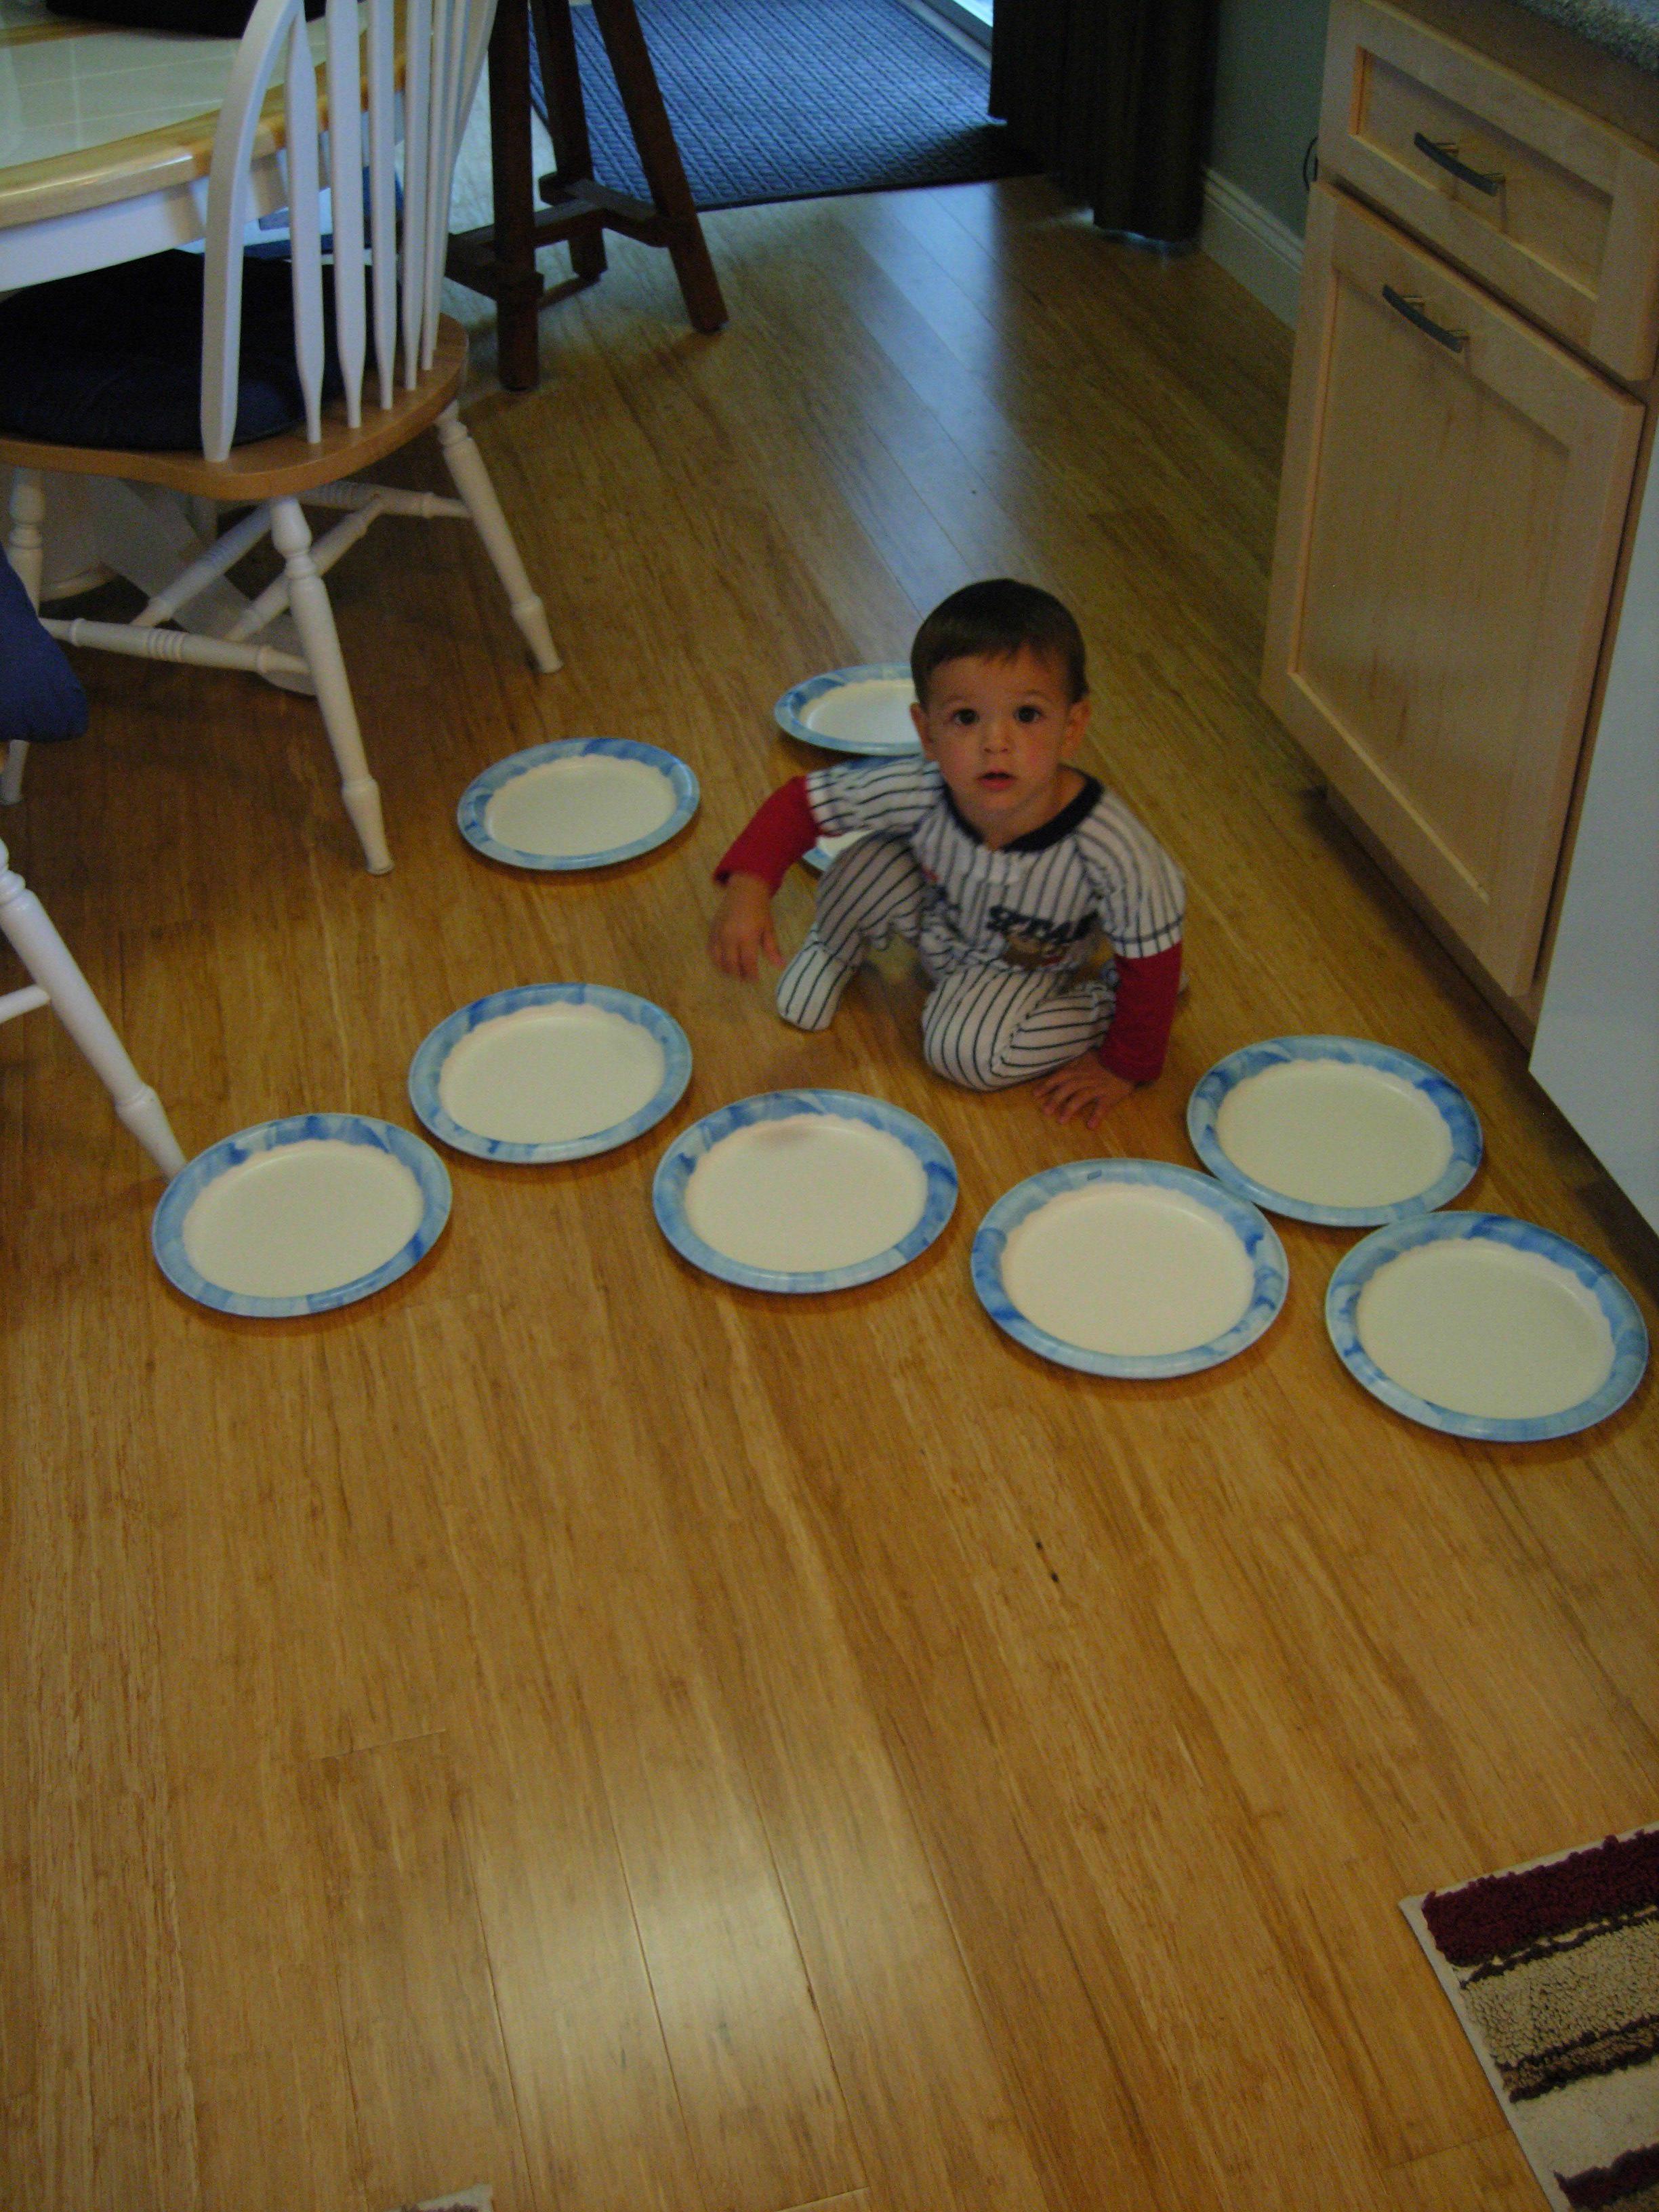 Brady and Plates